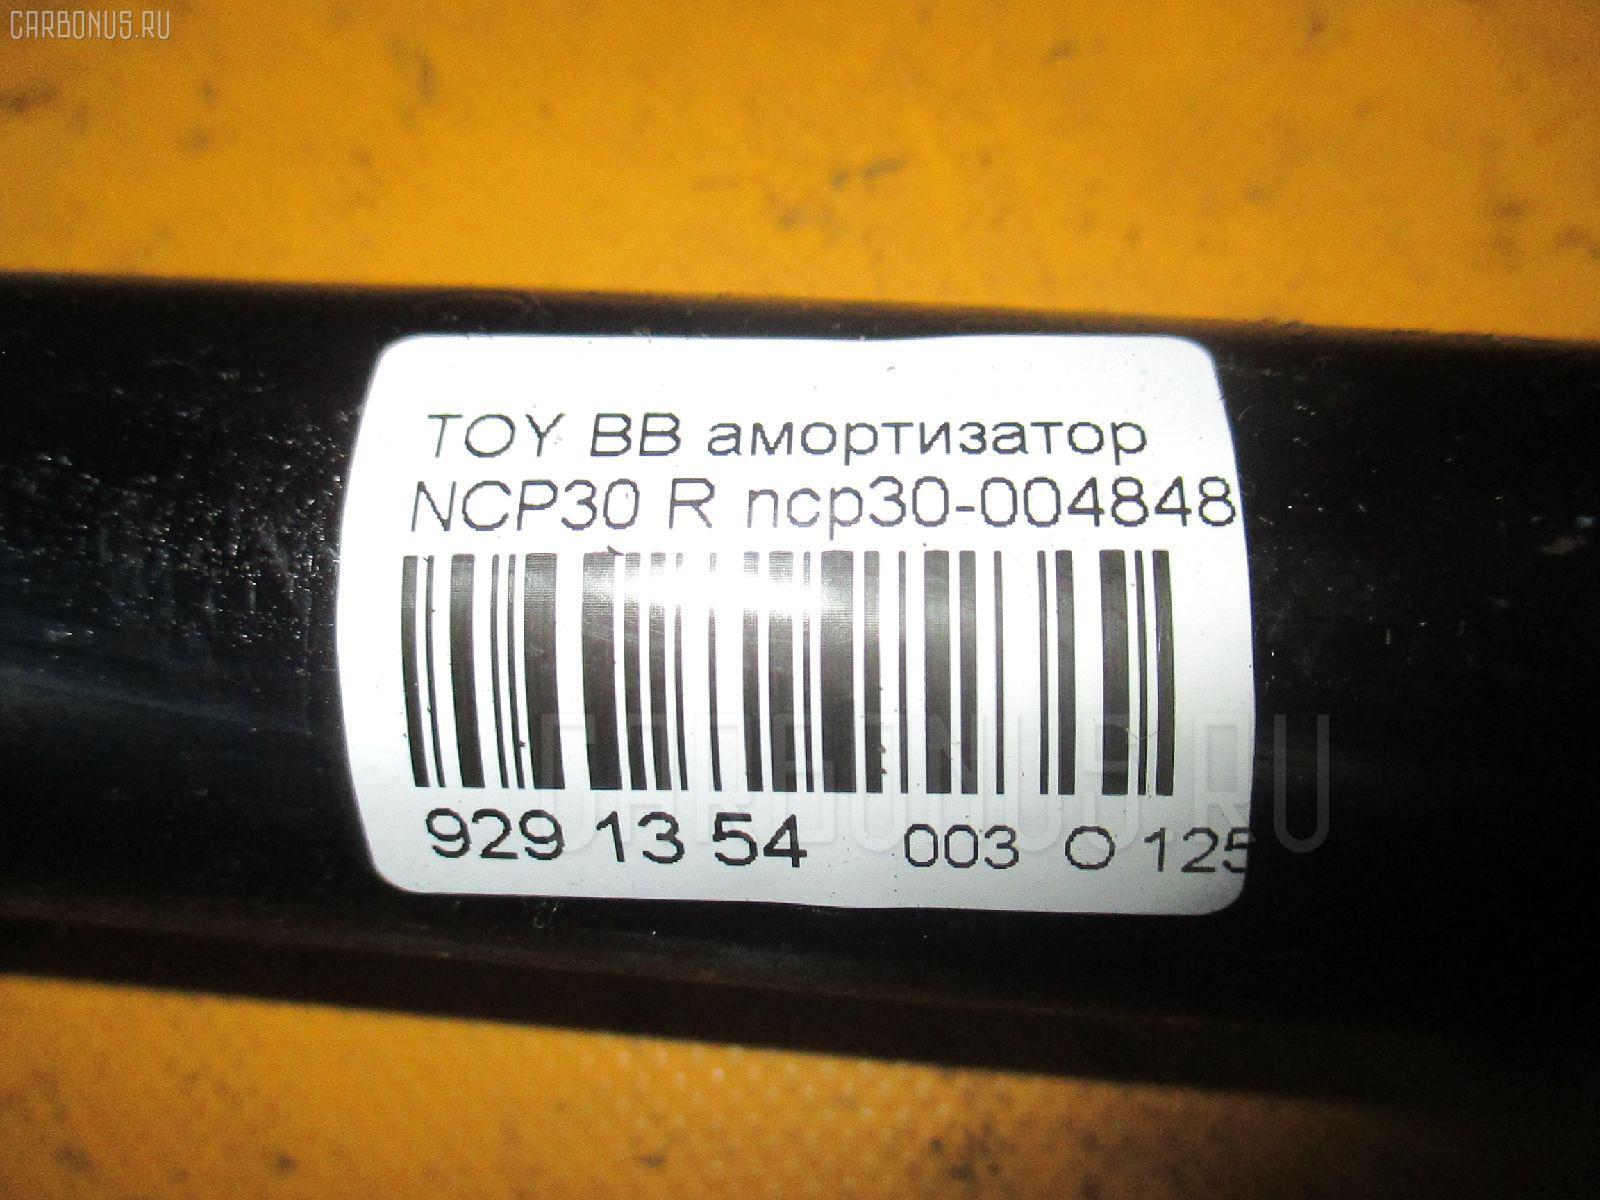 Амортизатор TOYOTA BB NCP30 Фото 2